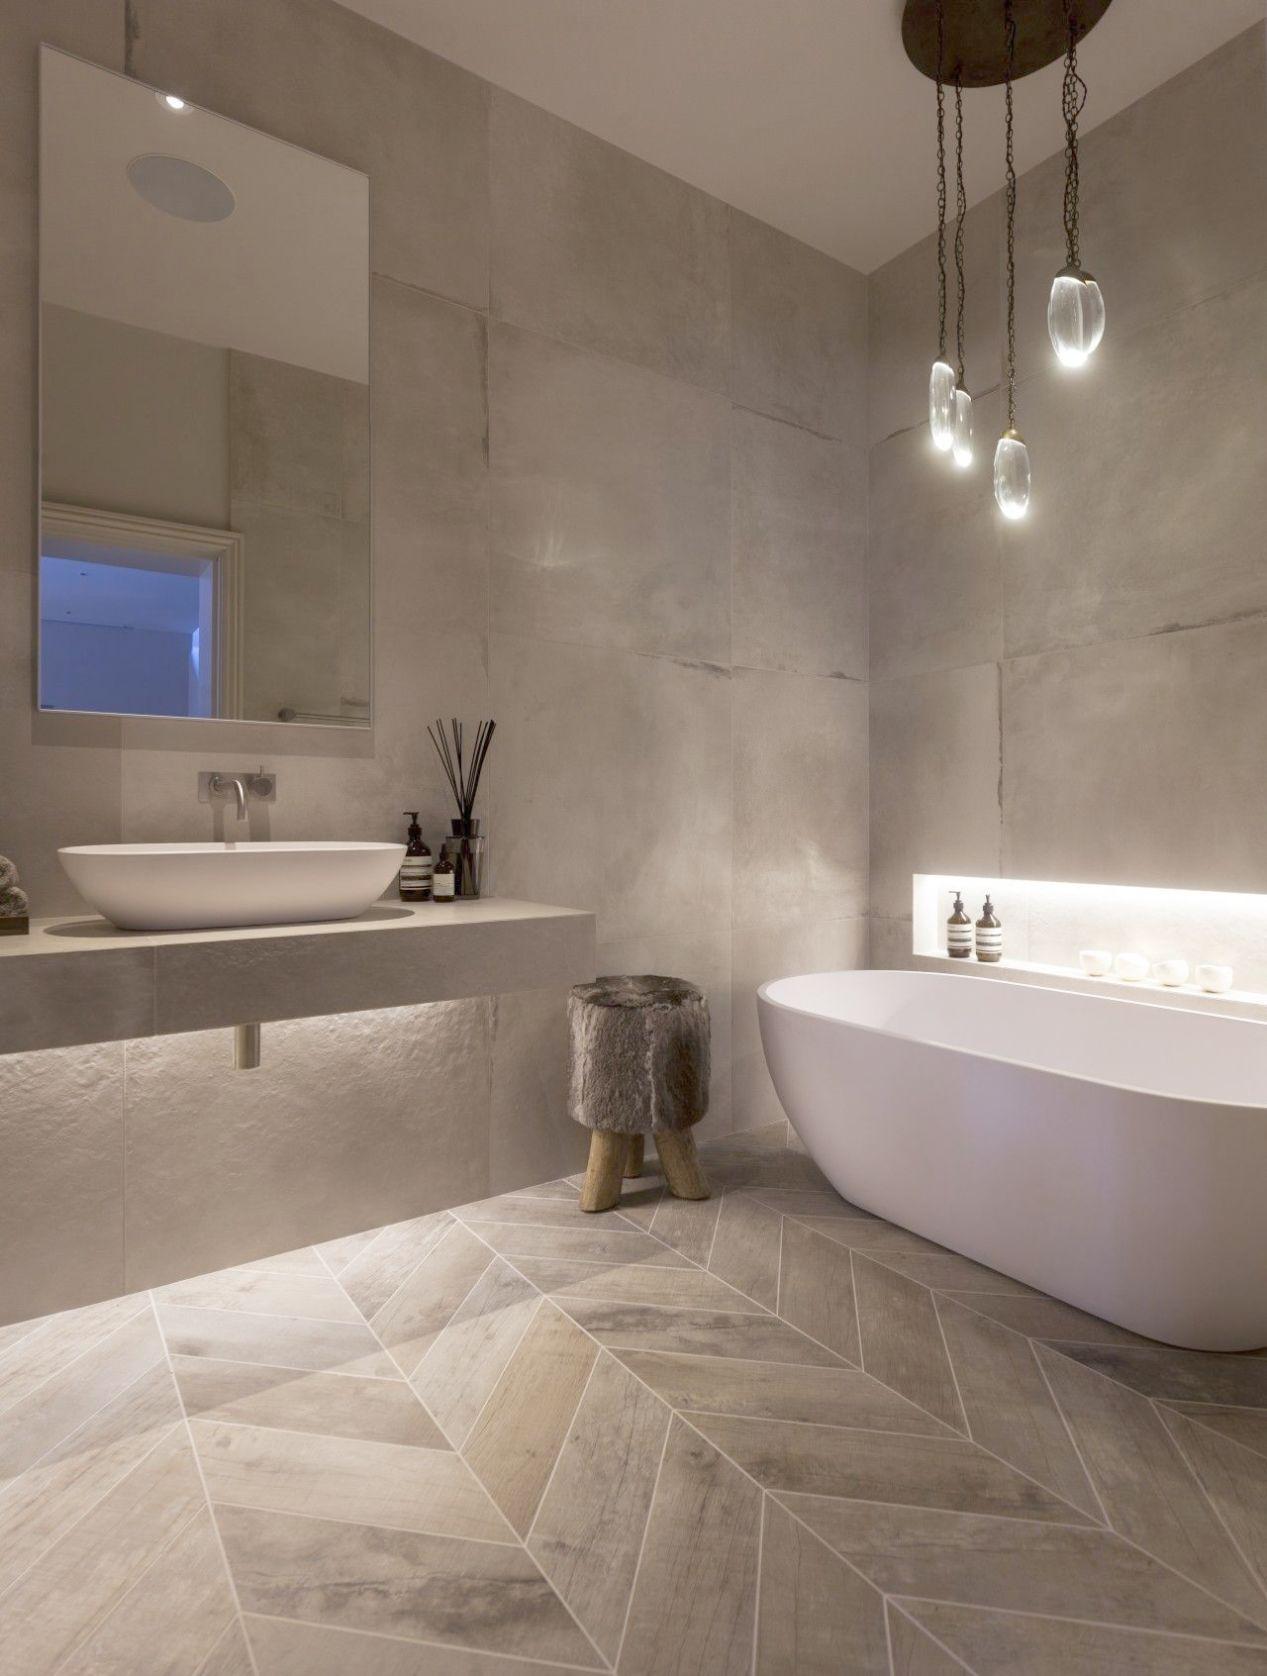 Promic 100 Cotton Luxury Hotel Spa Bath Towel Set 6 Piece